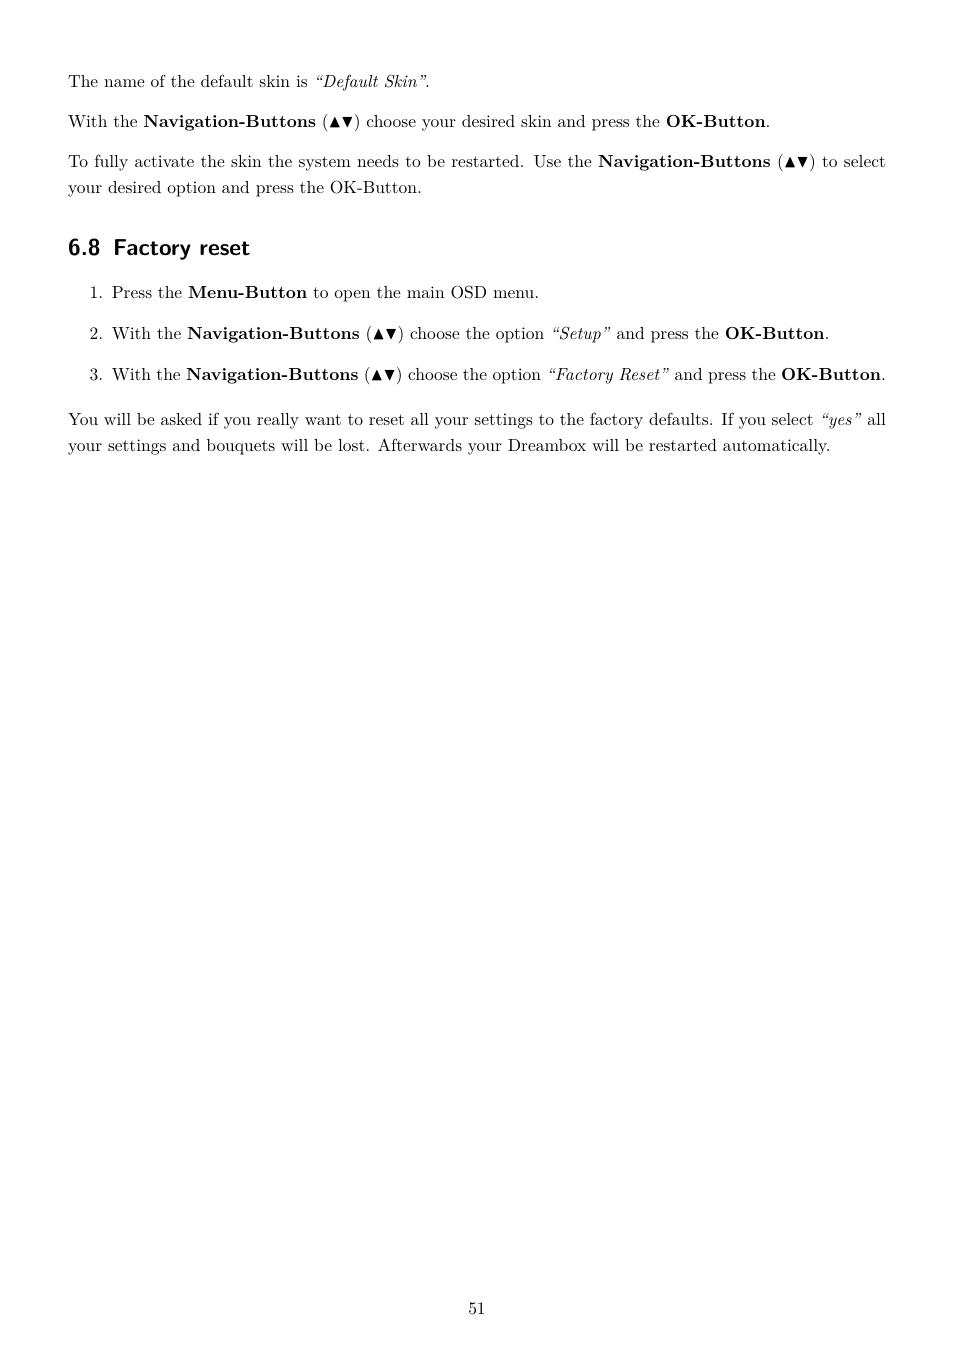 8 factory reset | Dream Property DM800 HD se User Manual